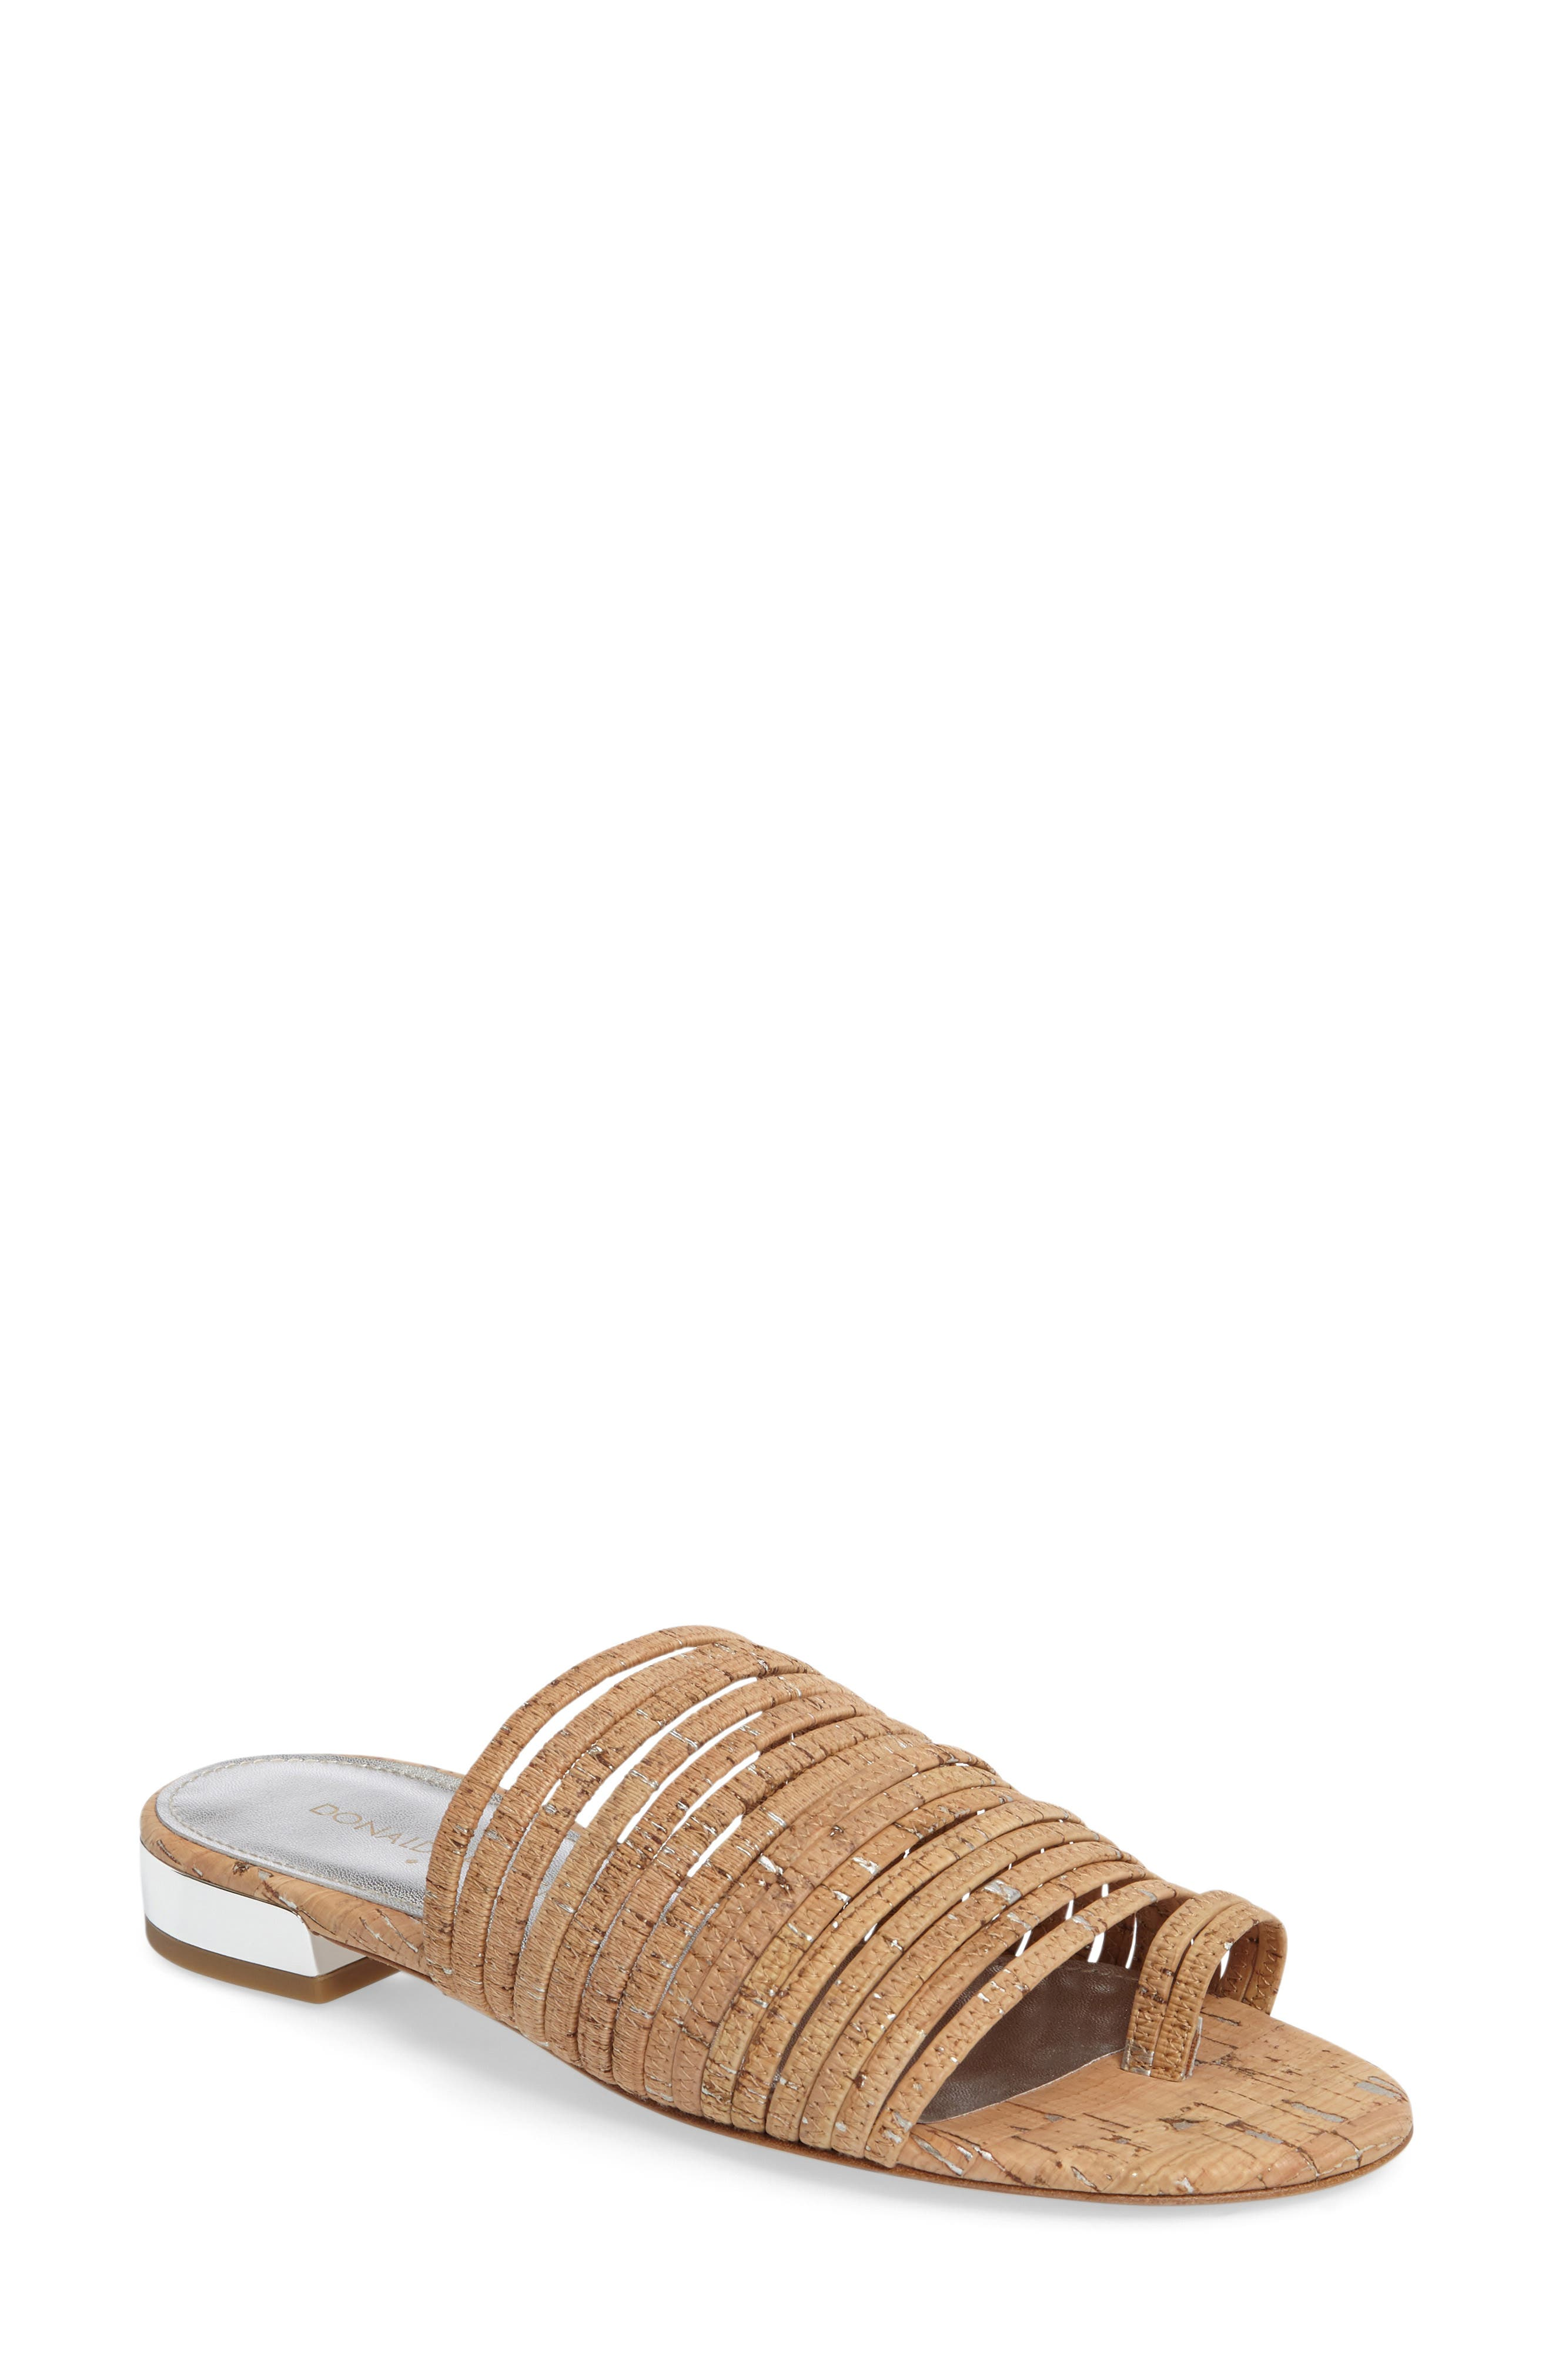 Alternate Image 1 Selected - Donald J Pliner Frea Strappy Sandal (Women)